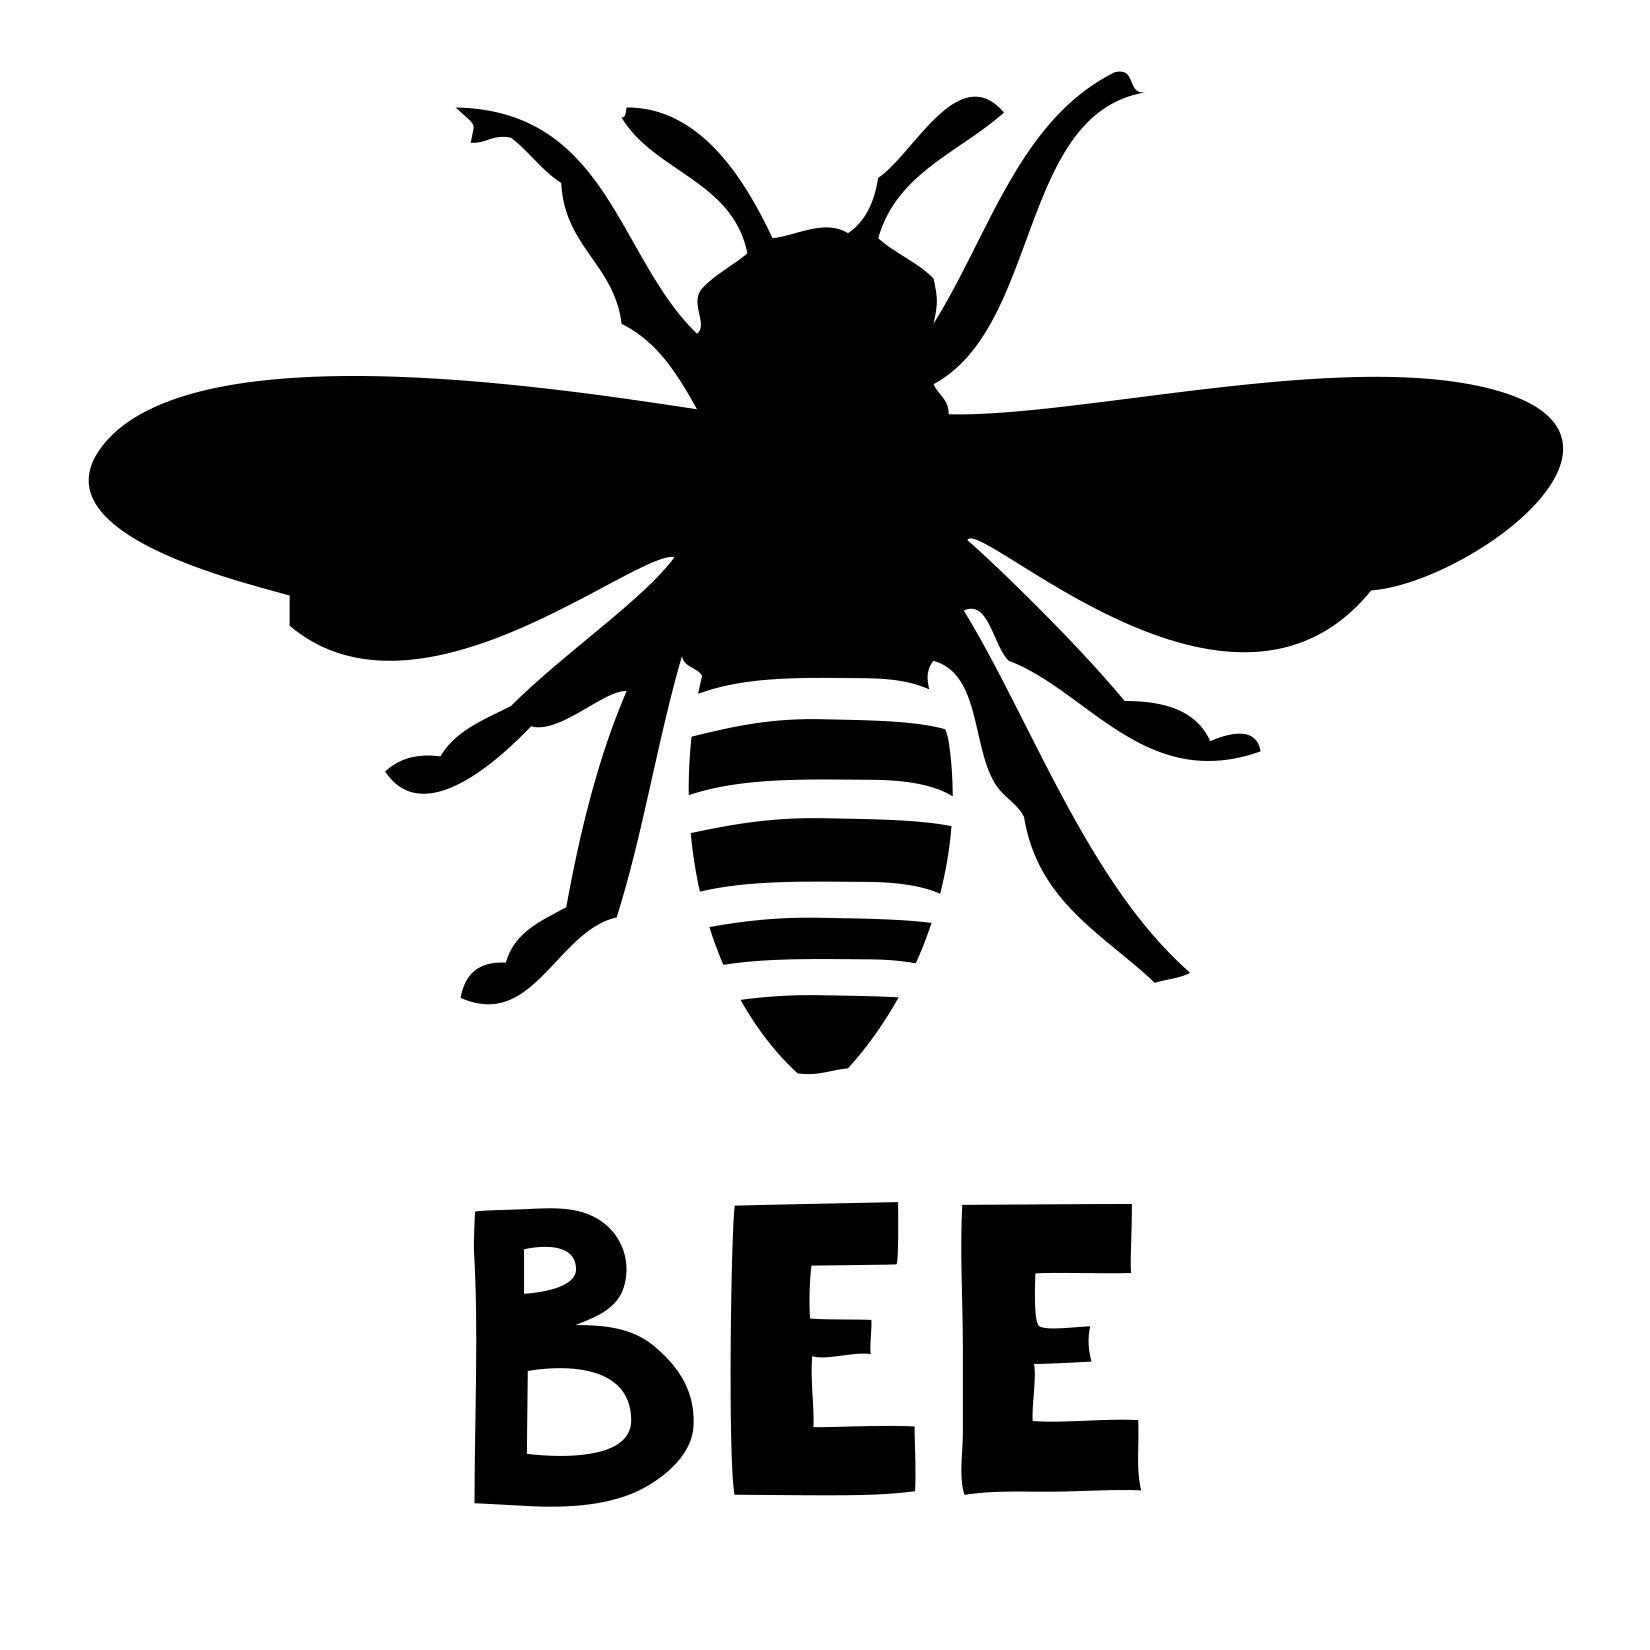 Honeybee Collage   Moomah the Magazine stencil to make ...